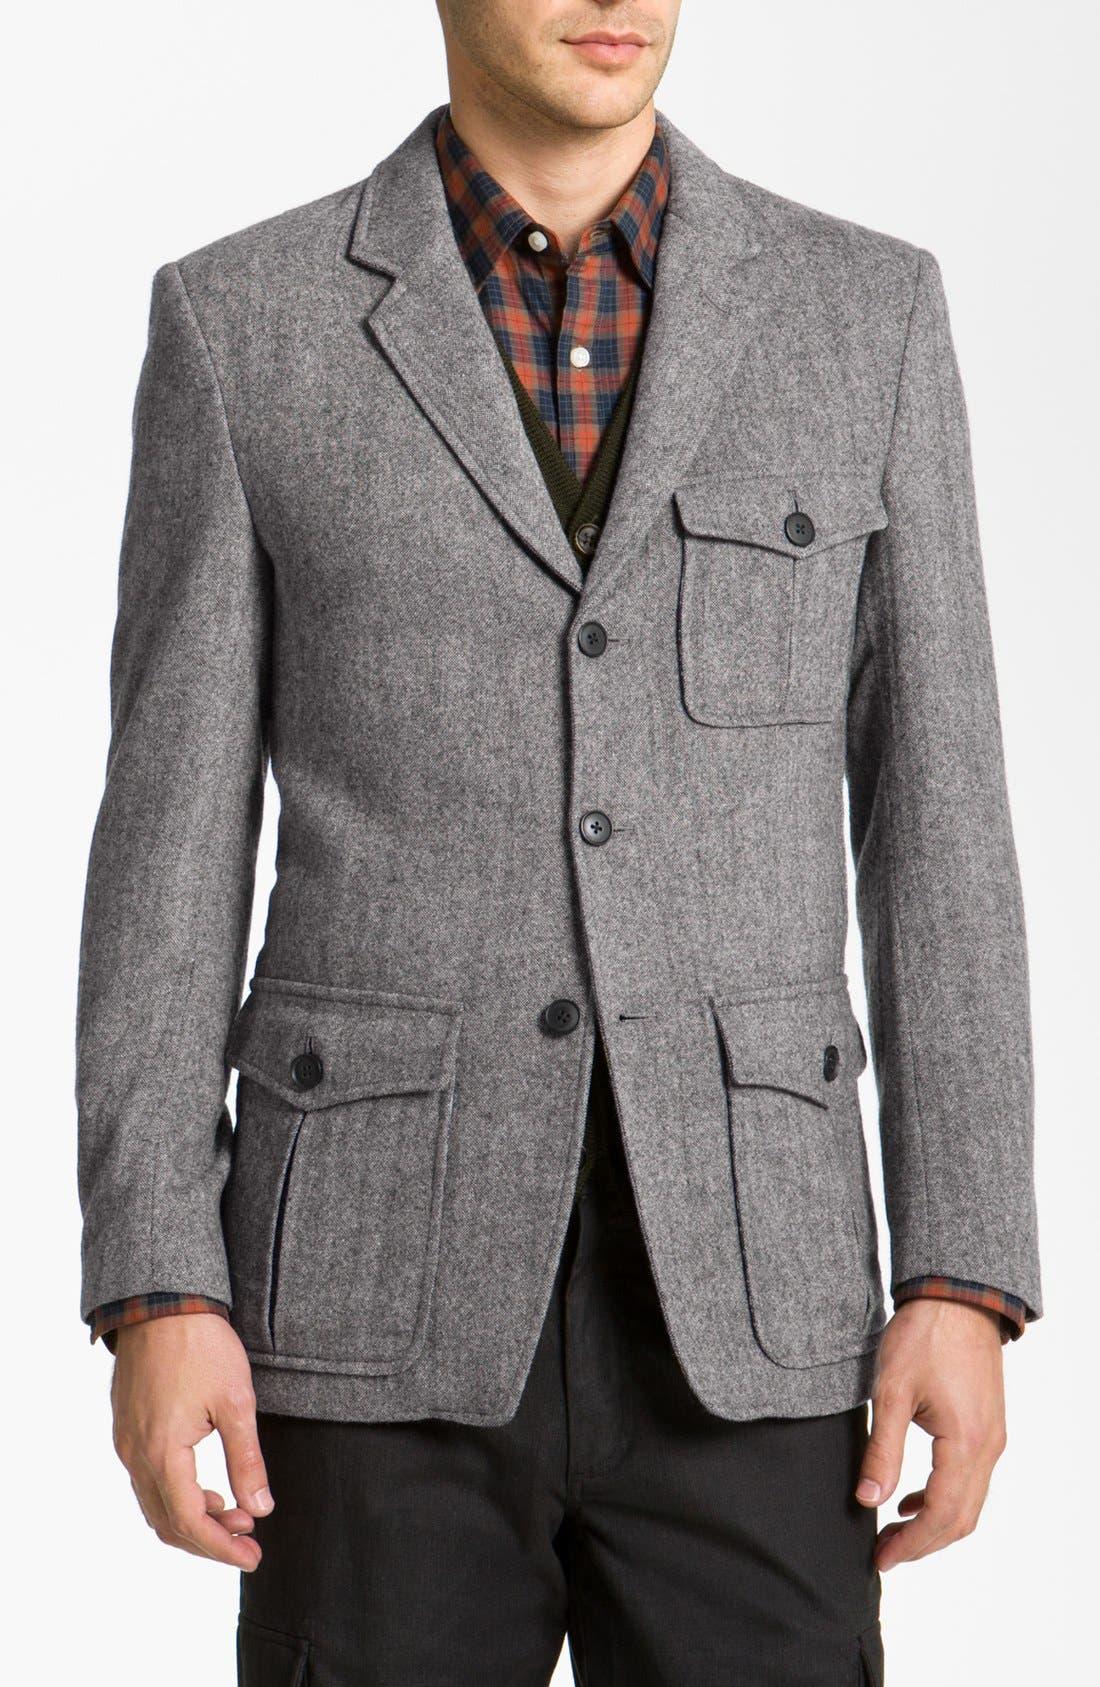 Main Image - Wallin & Bros. 'Hunting' Wool Blend Sportcoat